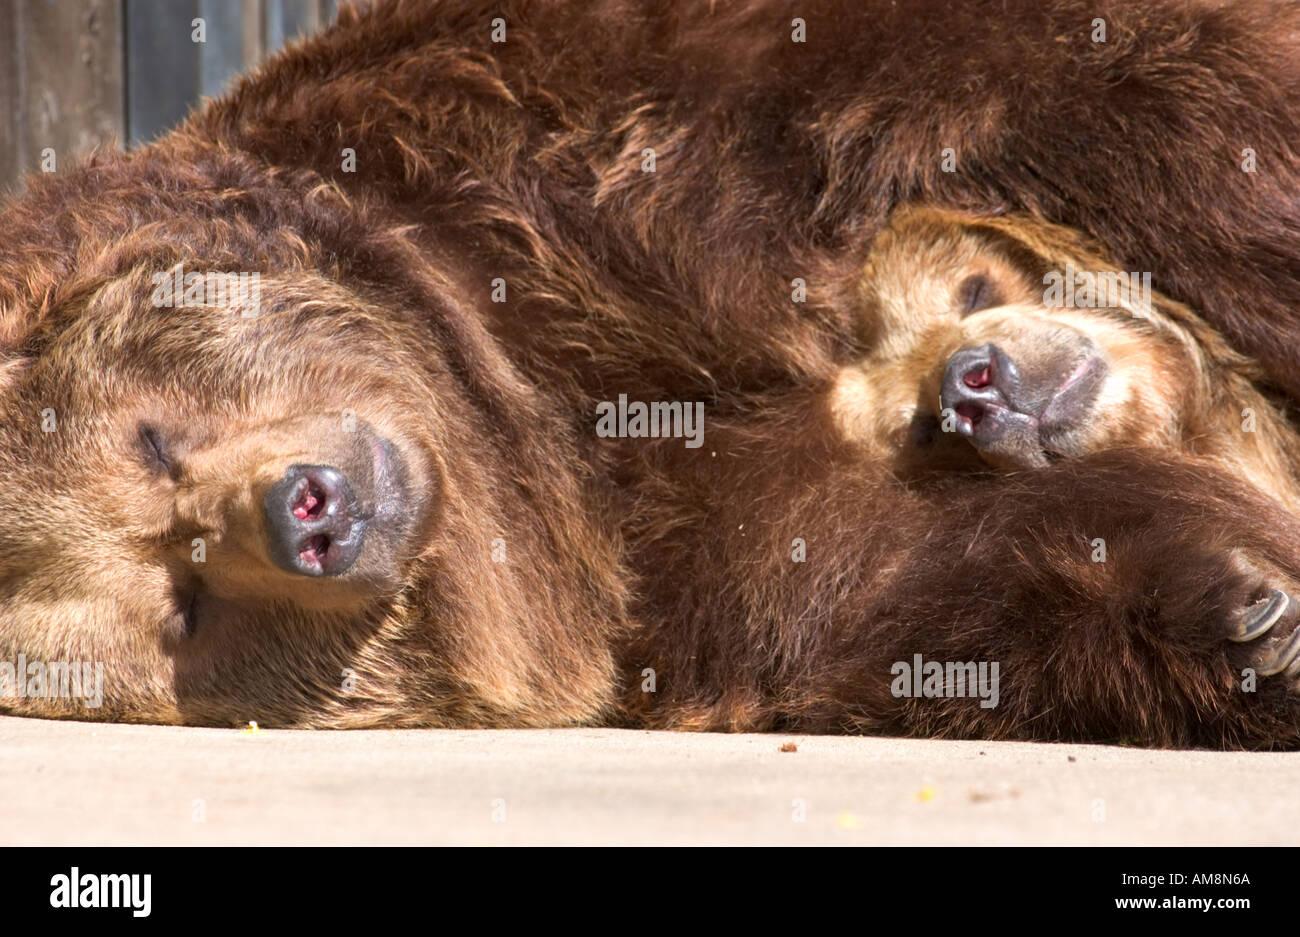 sleeping brown bears - Stock Image